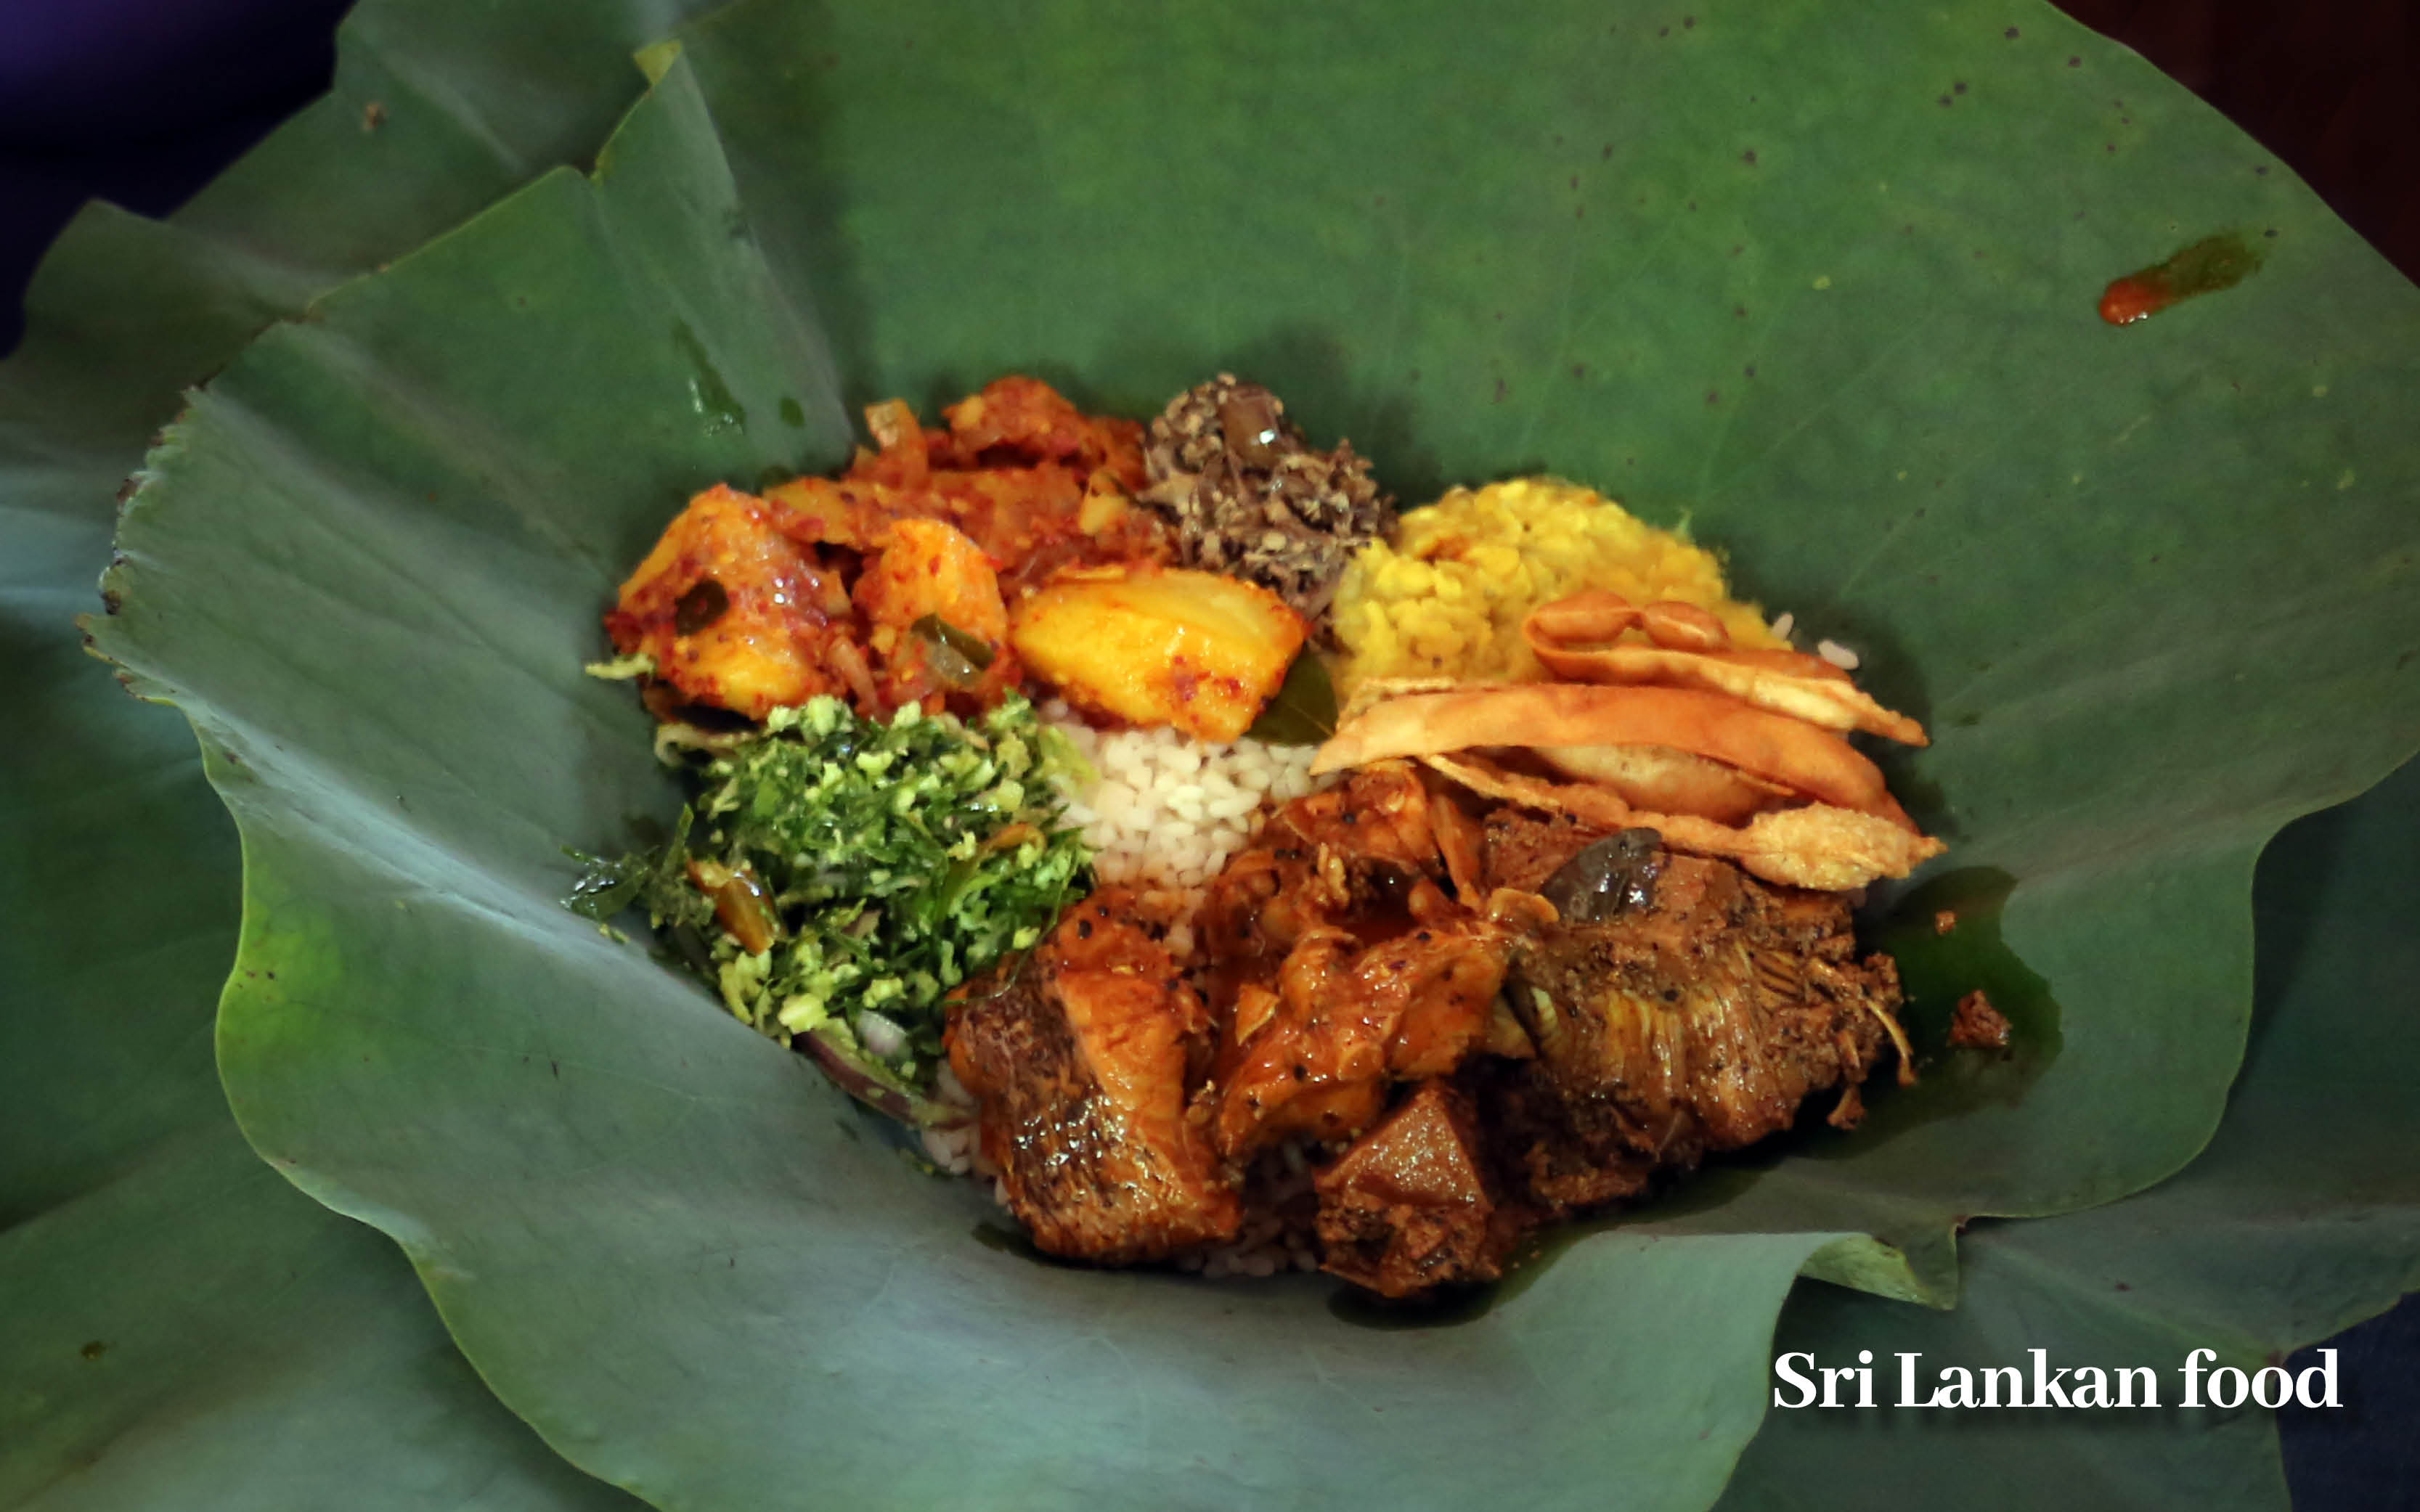 Sri Lanka holiday offer local experience food